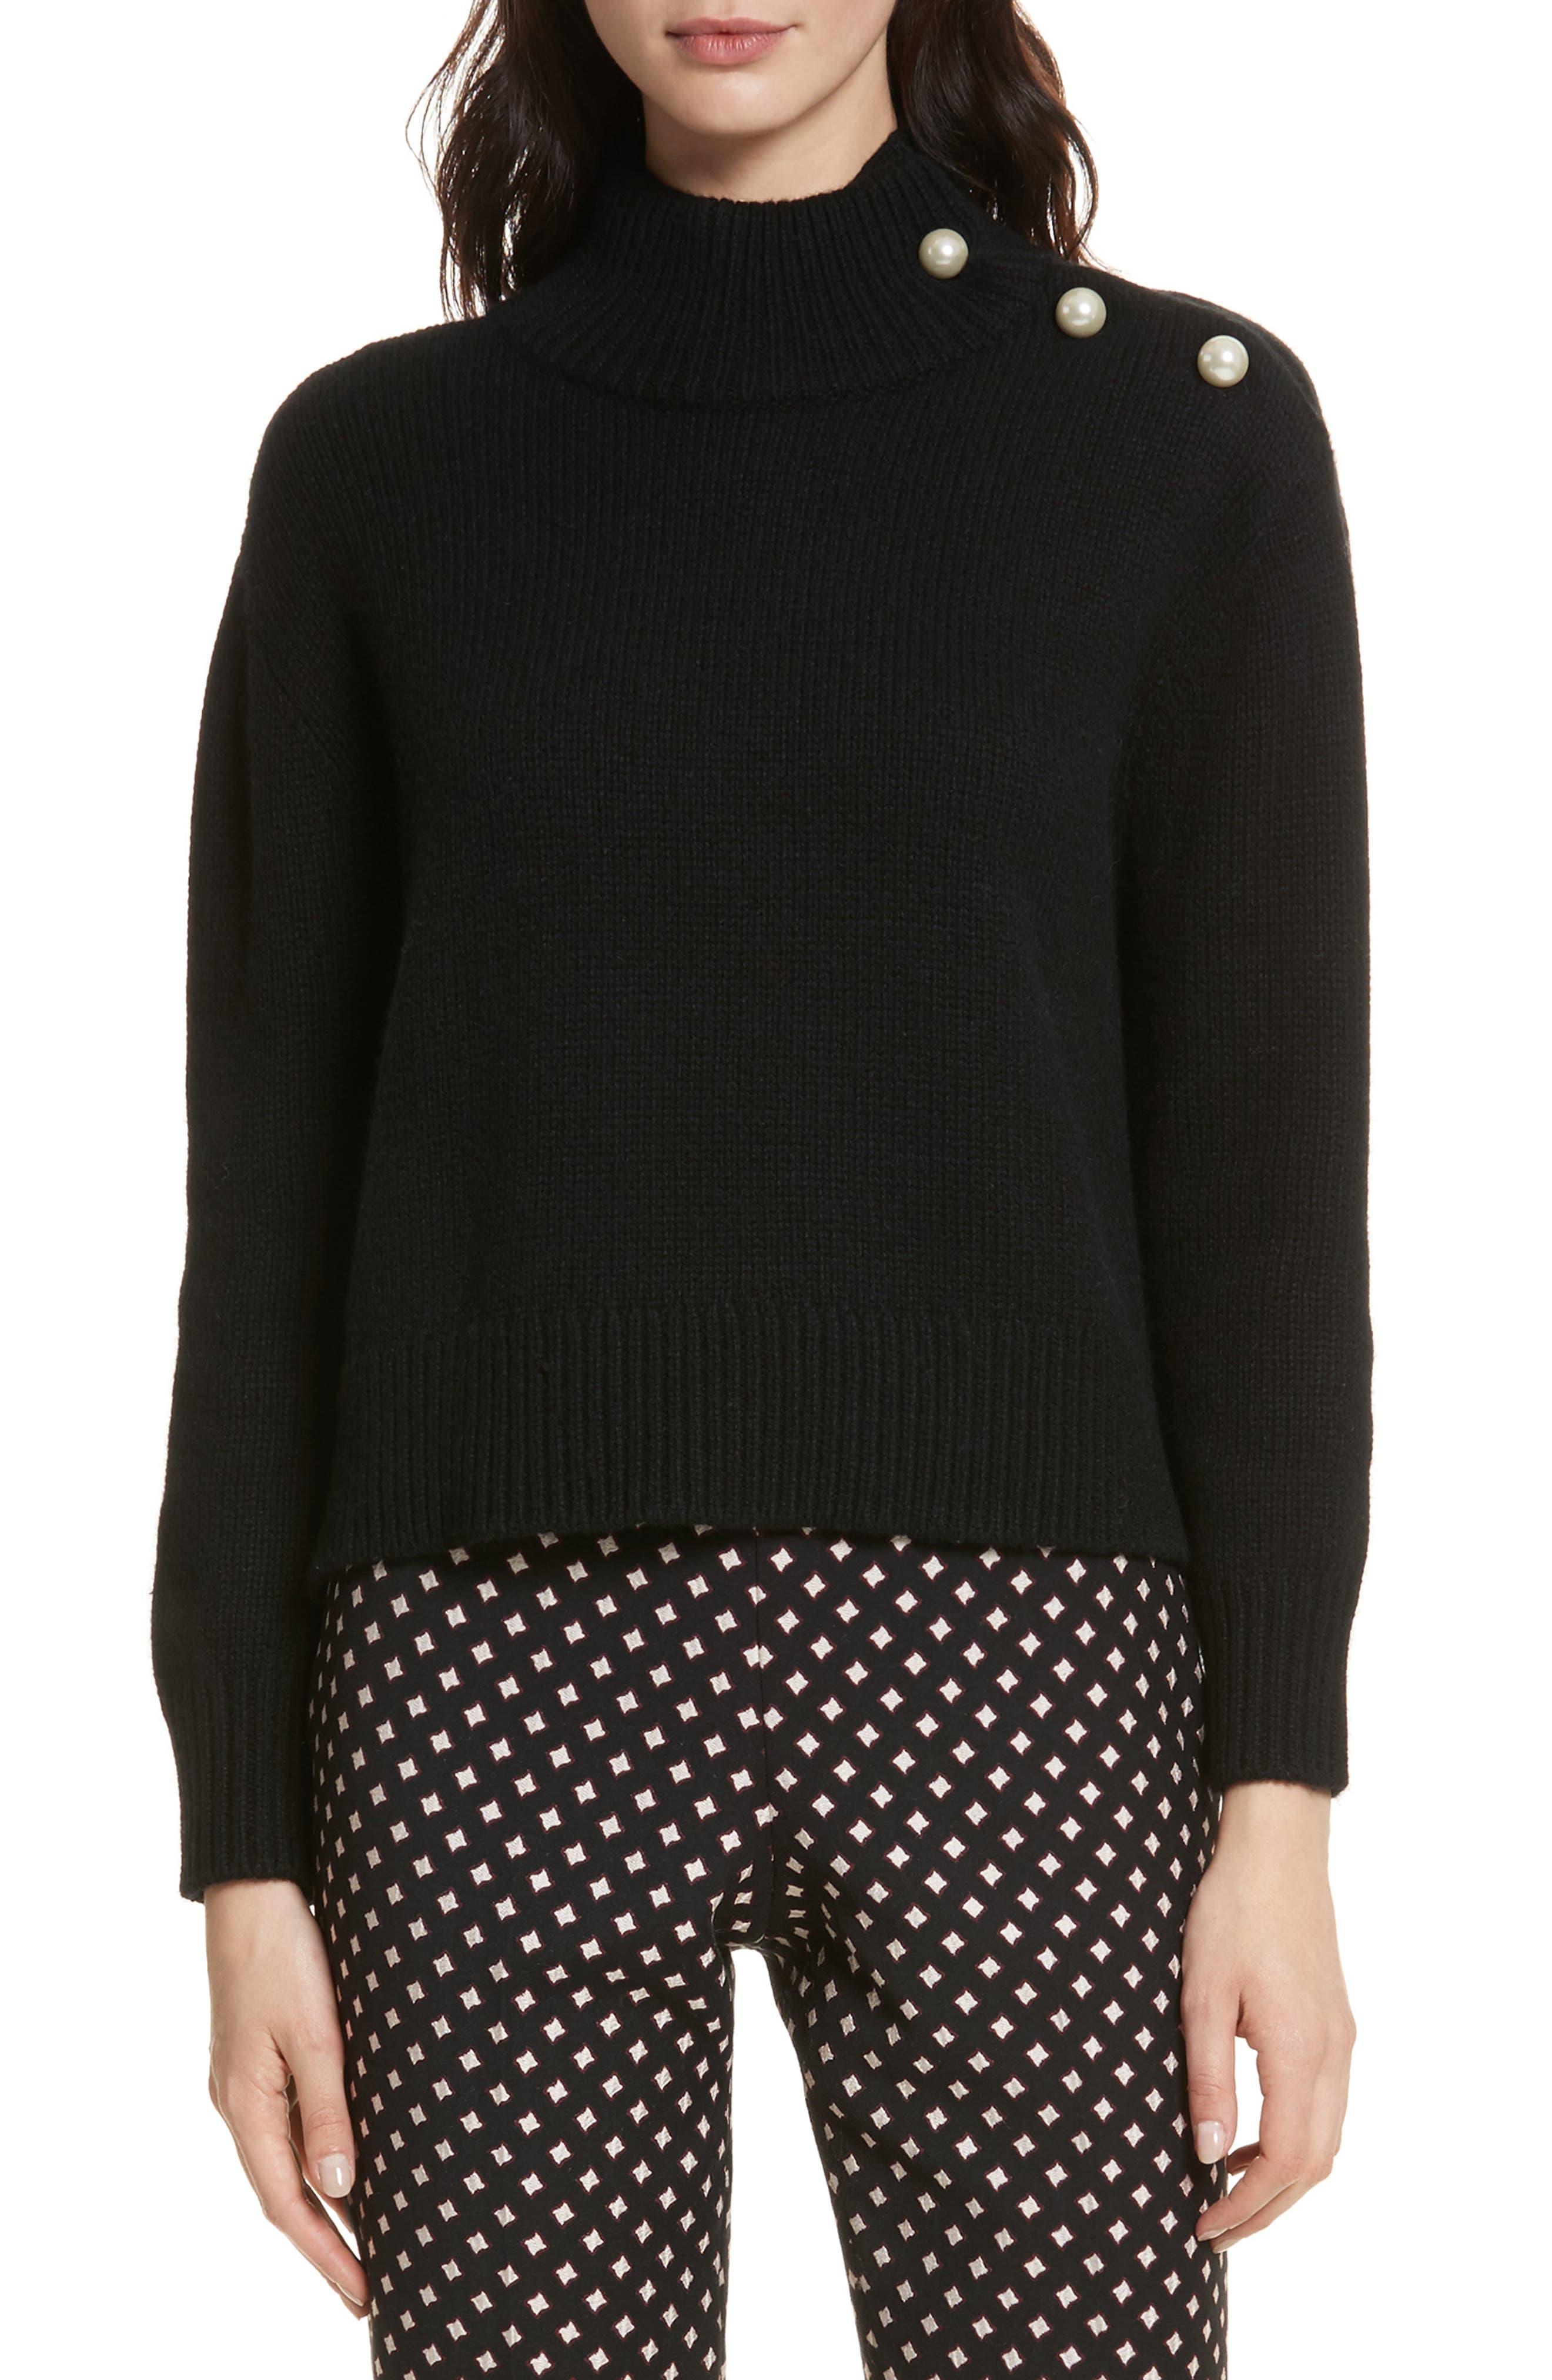 Women's Black Turtleneck Sweaters | Nordstrom